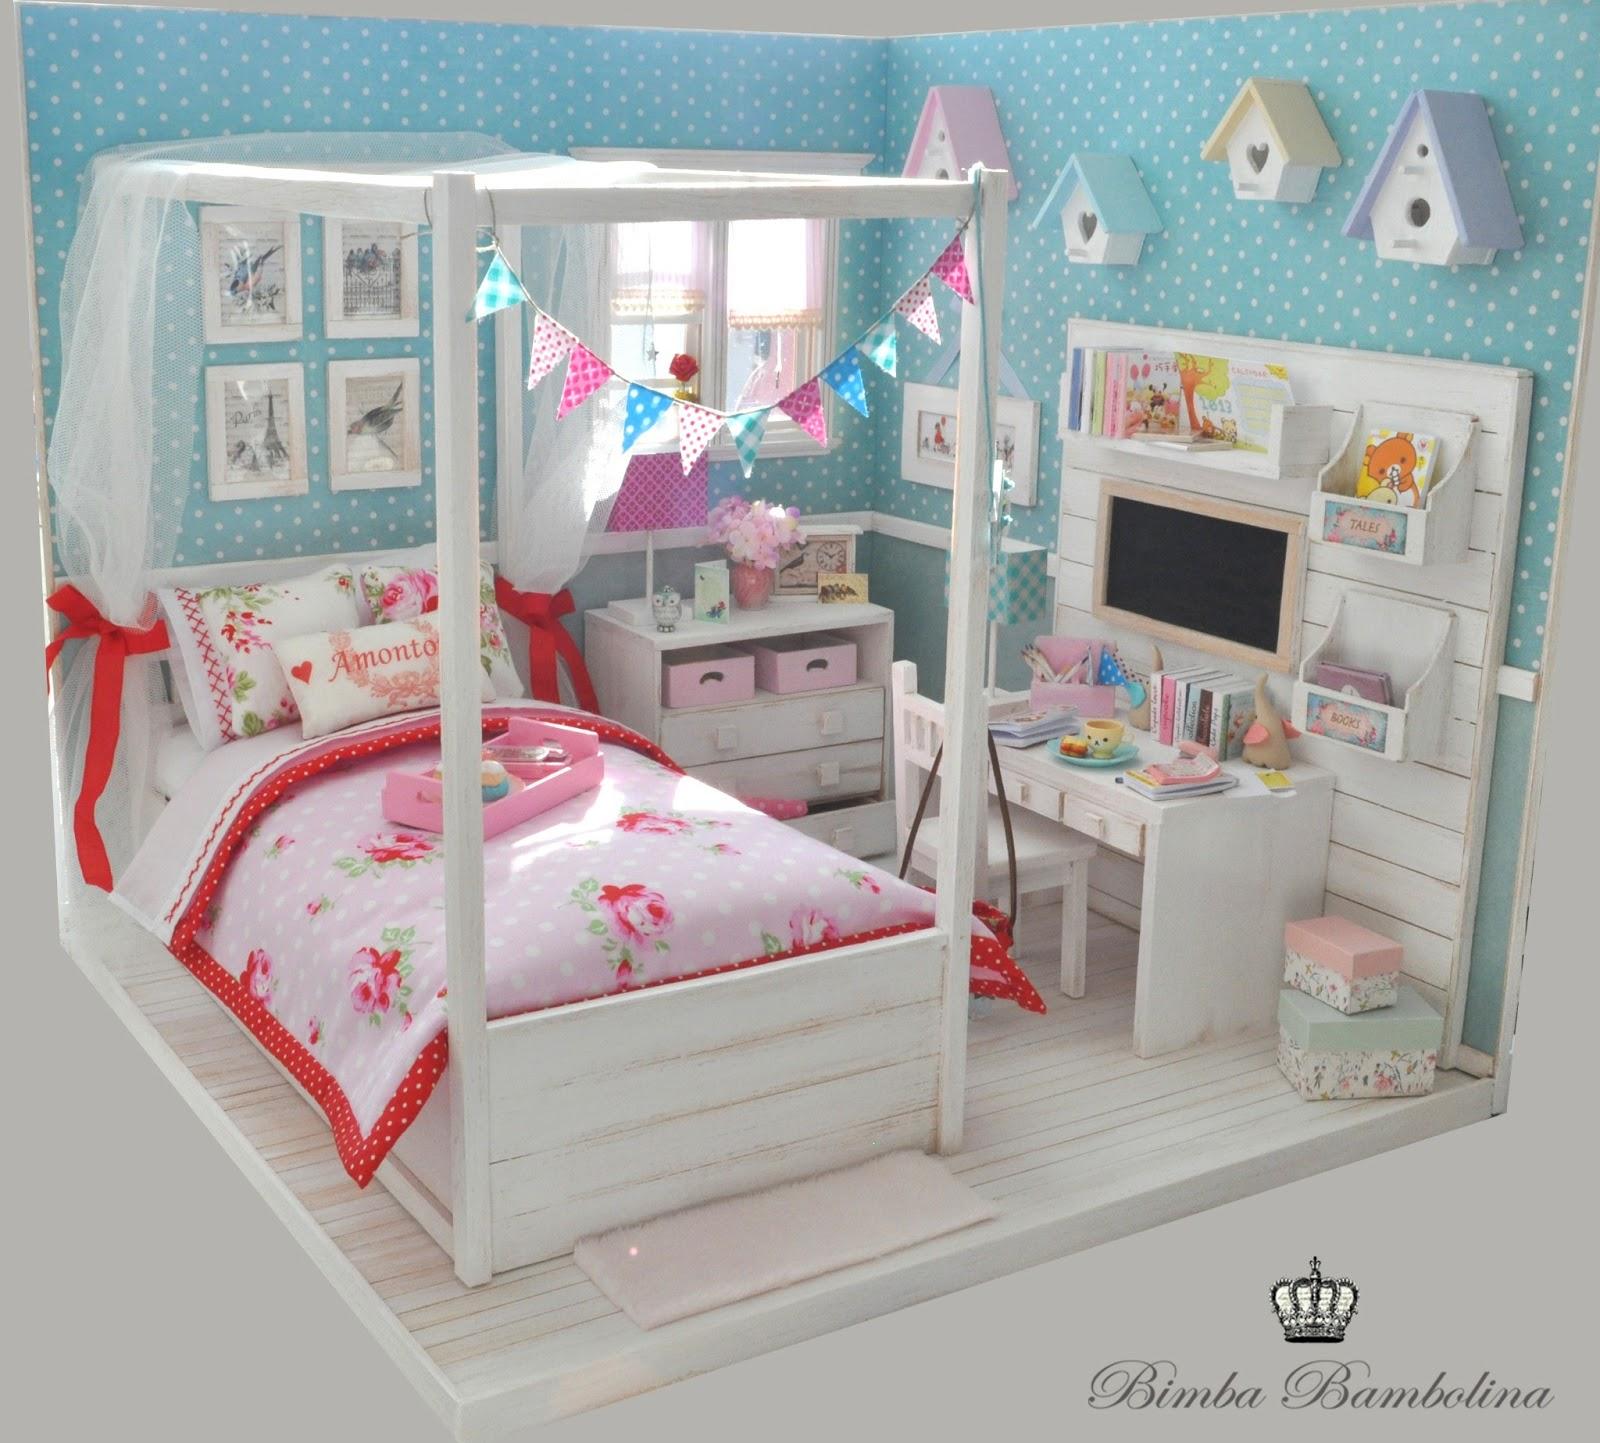 Bimba bambolina ooak diorama shabby dreams for amy for My dream bedroom maker